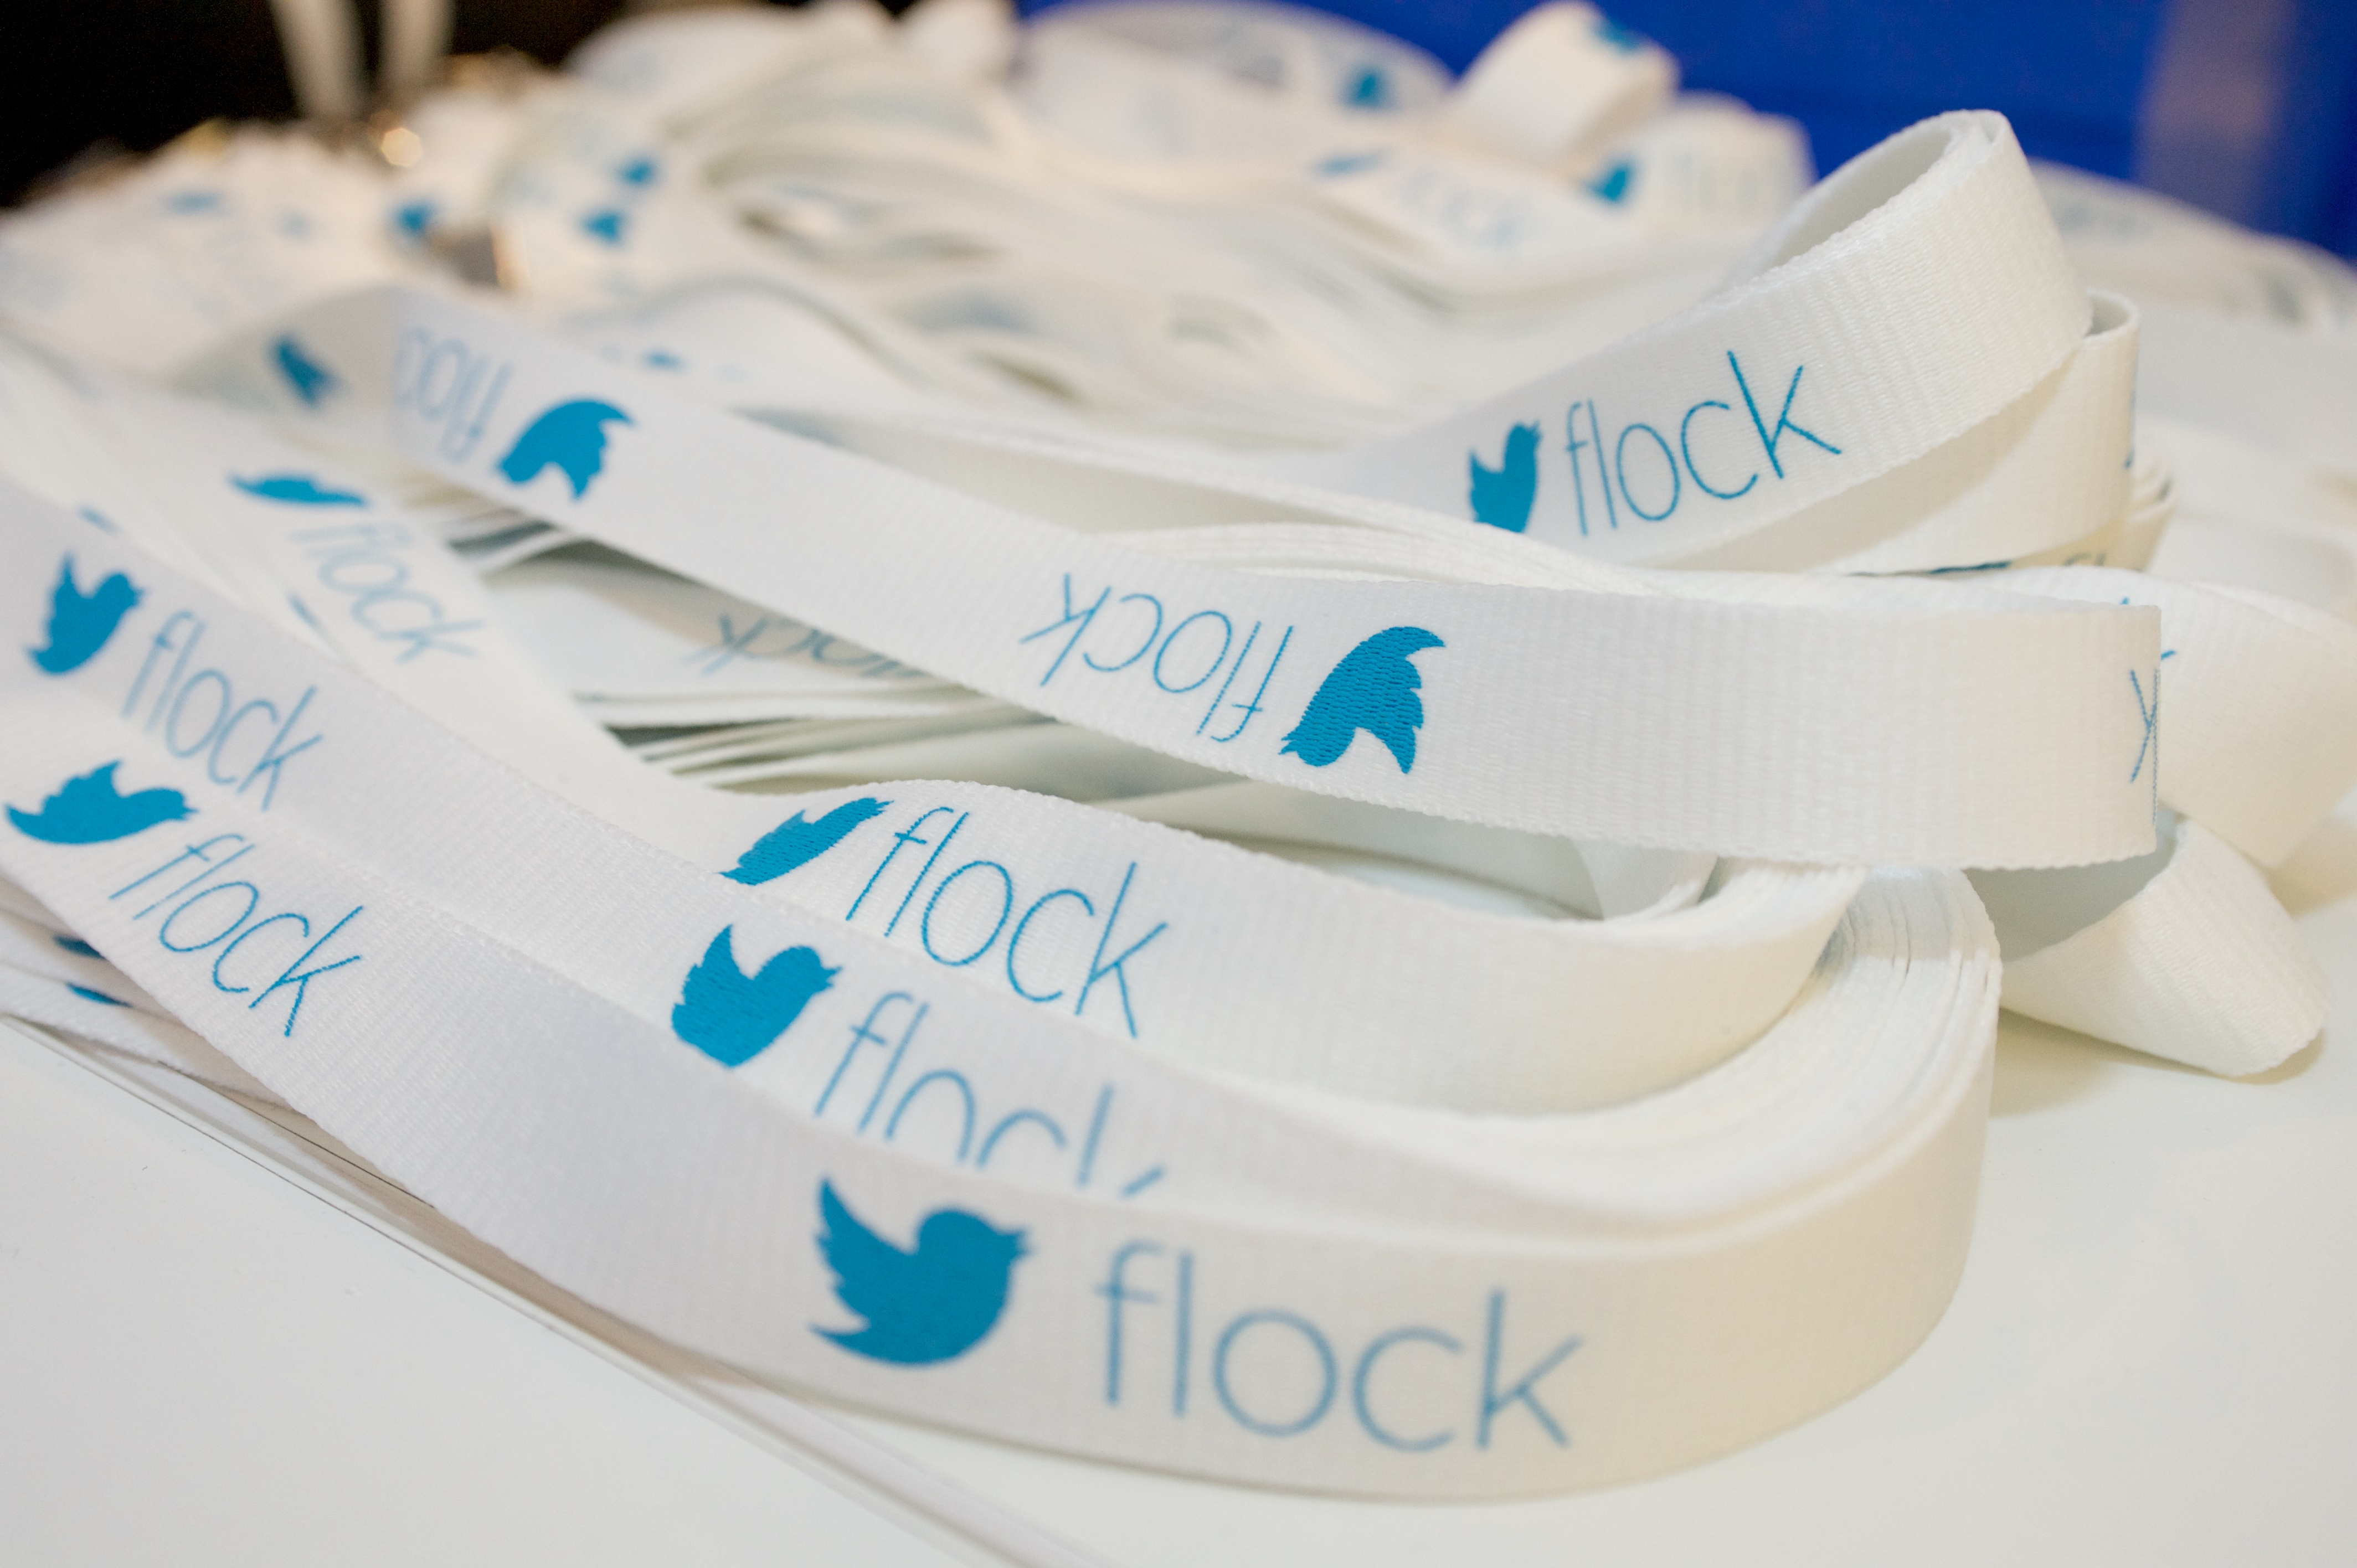 TwitterFlock 5